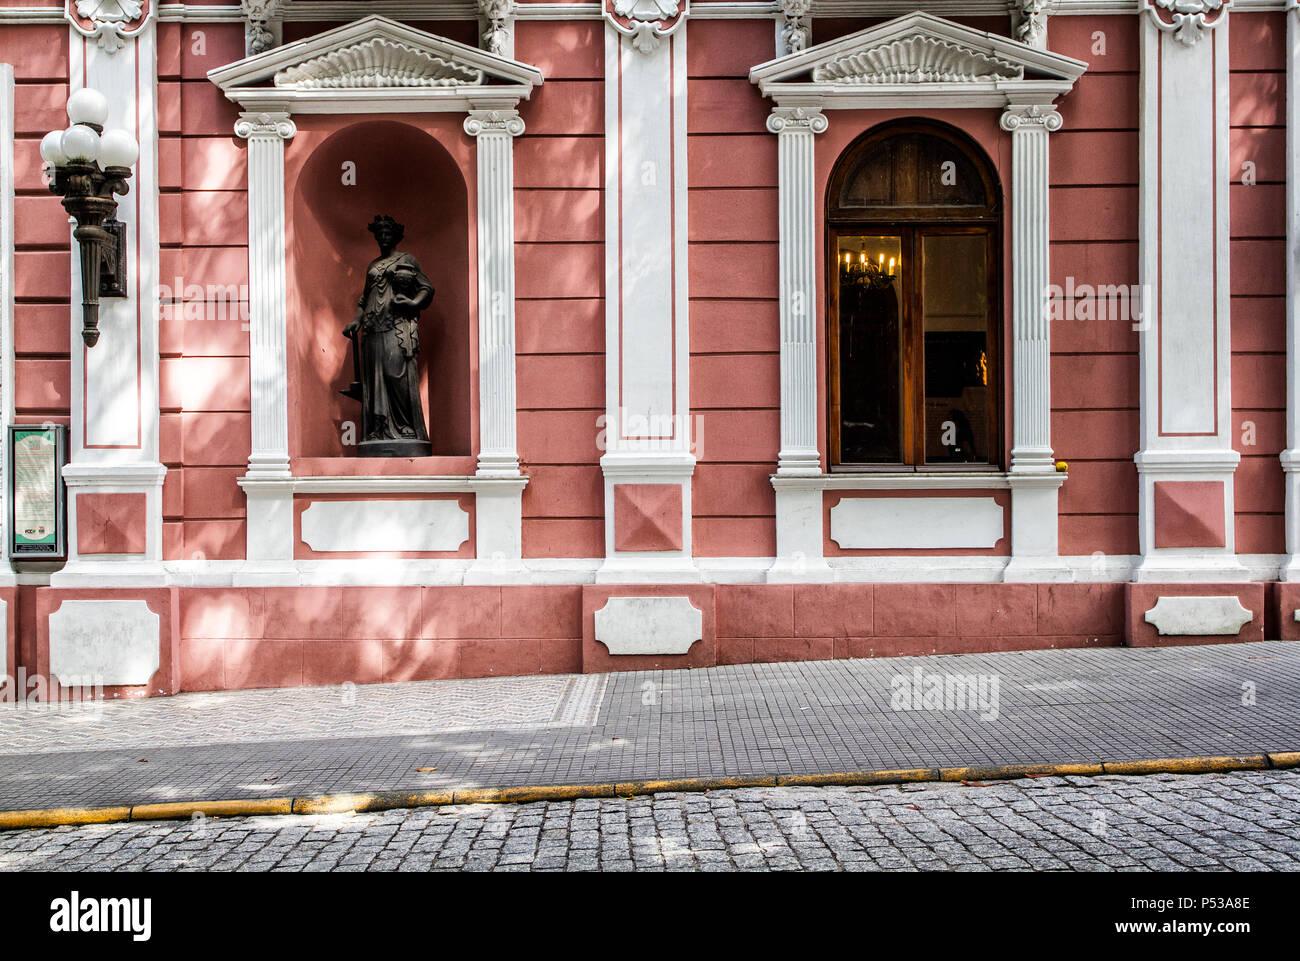 Detail of Cruz e Sousa Palace facade, house of Santa Catarina Historic Museum. Florianopolis, Santa Catarina, Brazil. - Stock Image